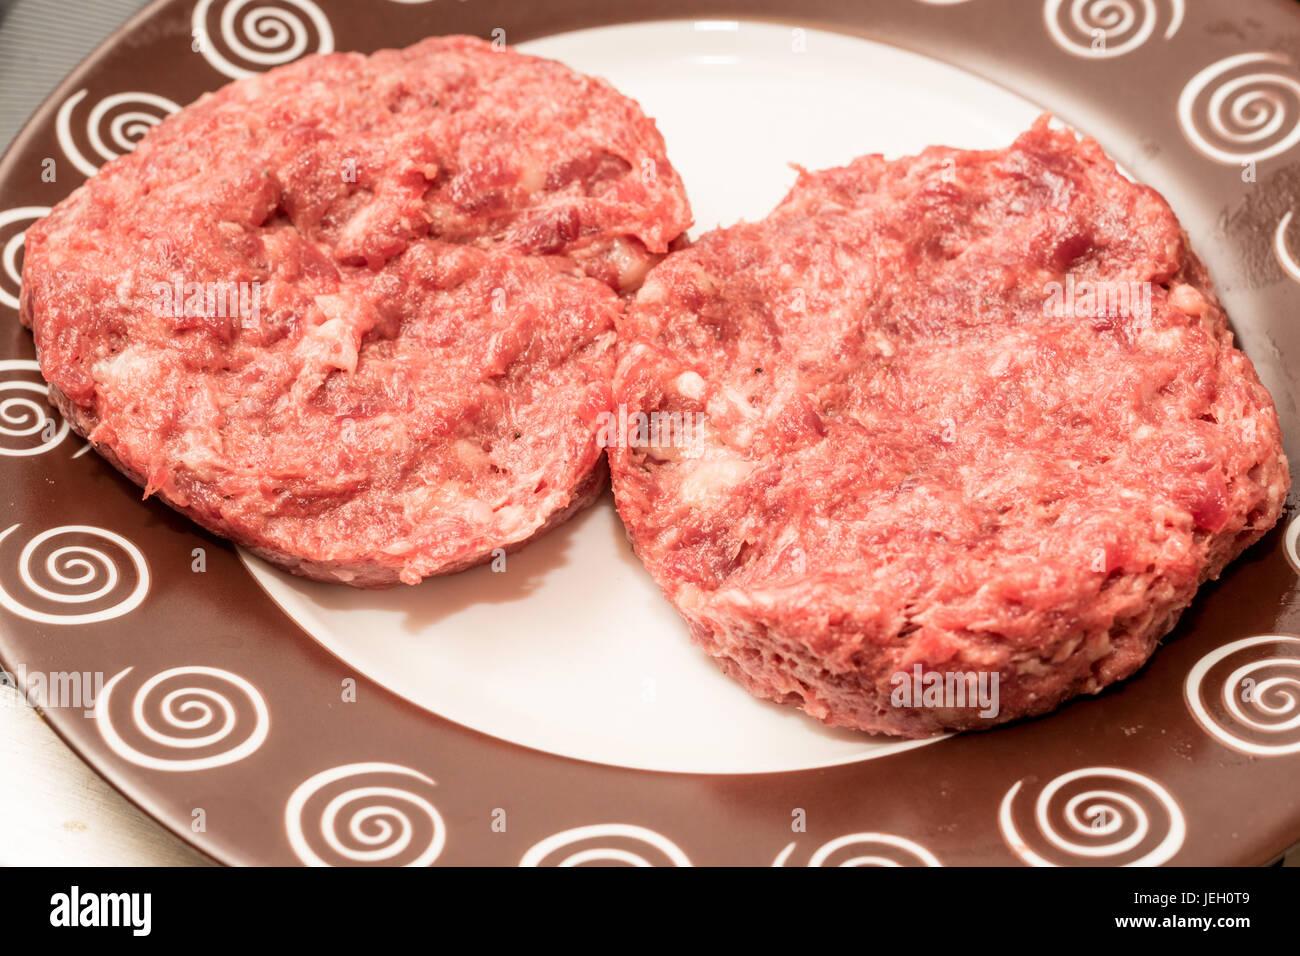 Fresh raw beef burger patties on plate - Stock Image